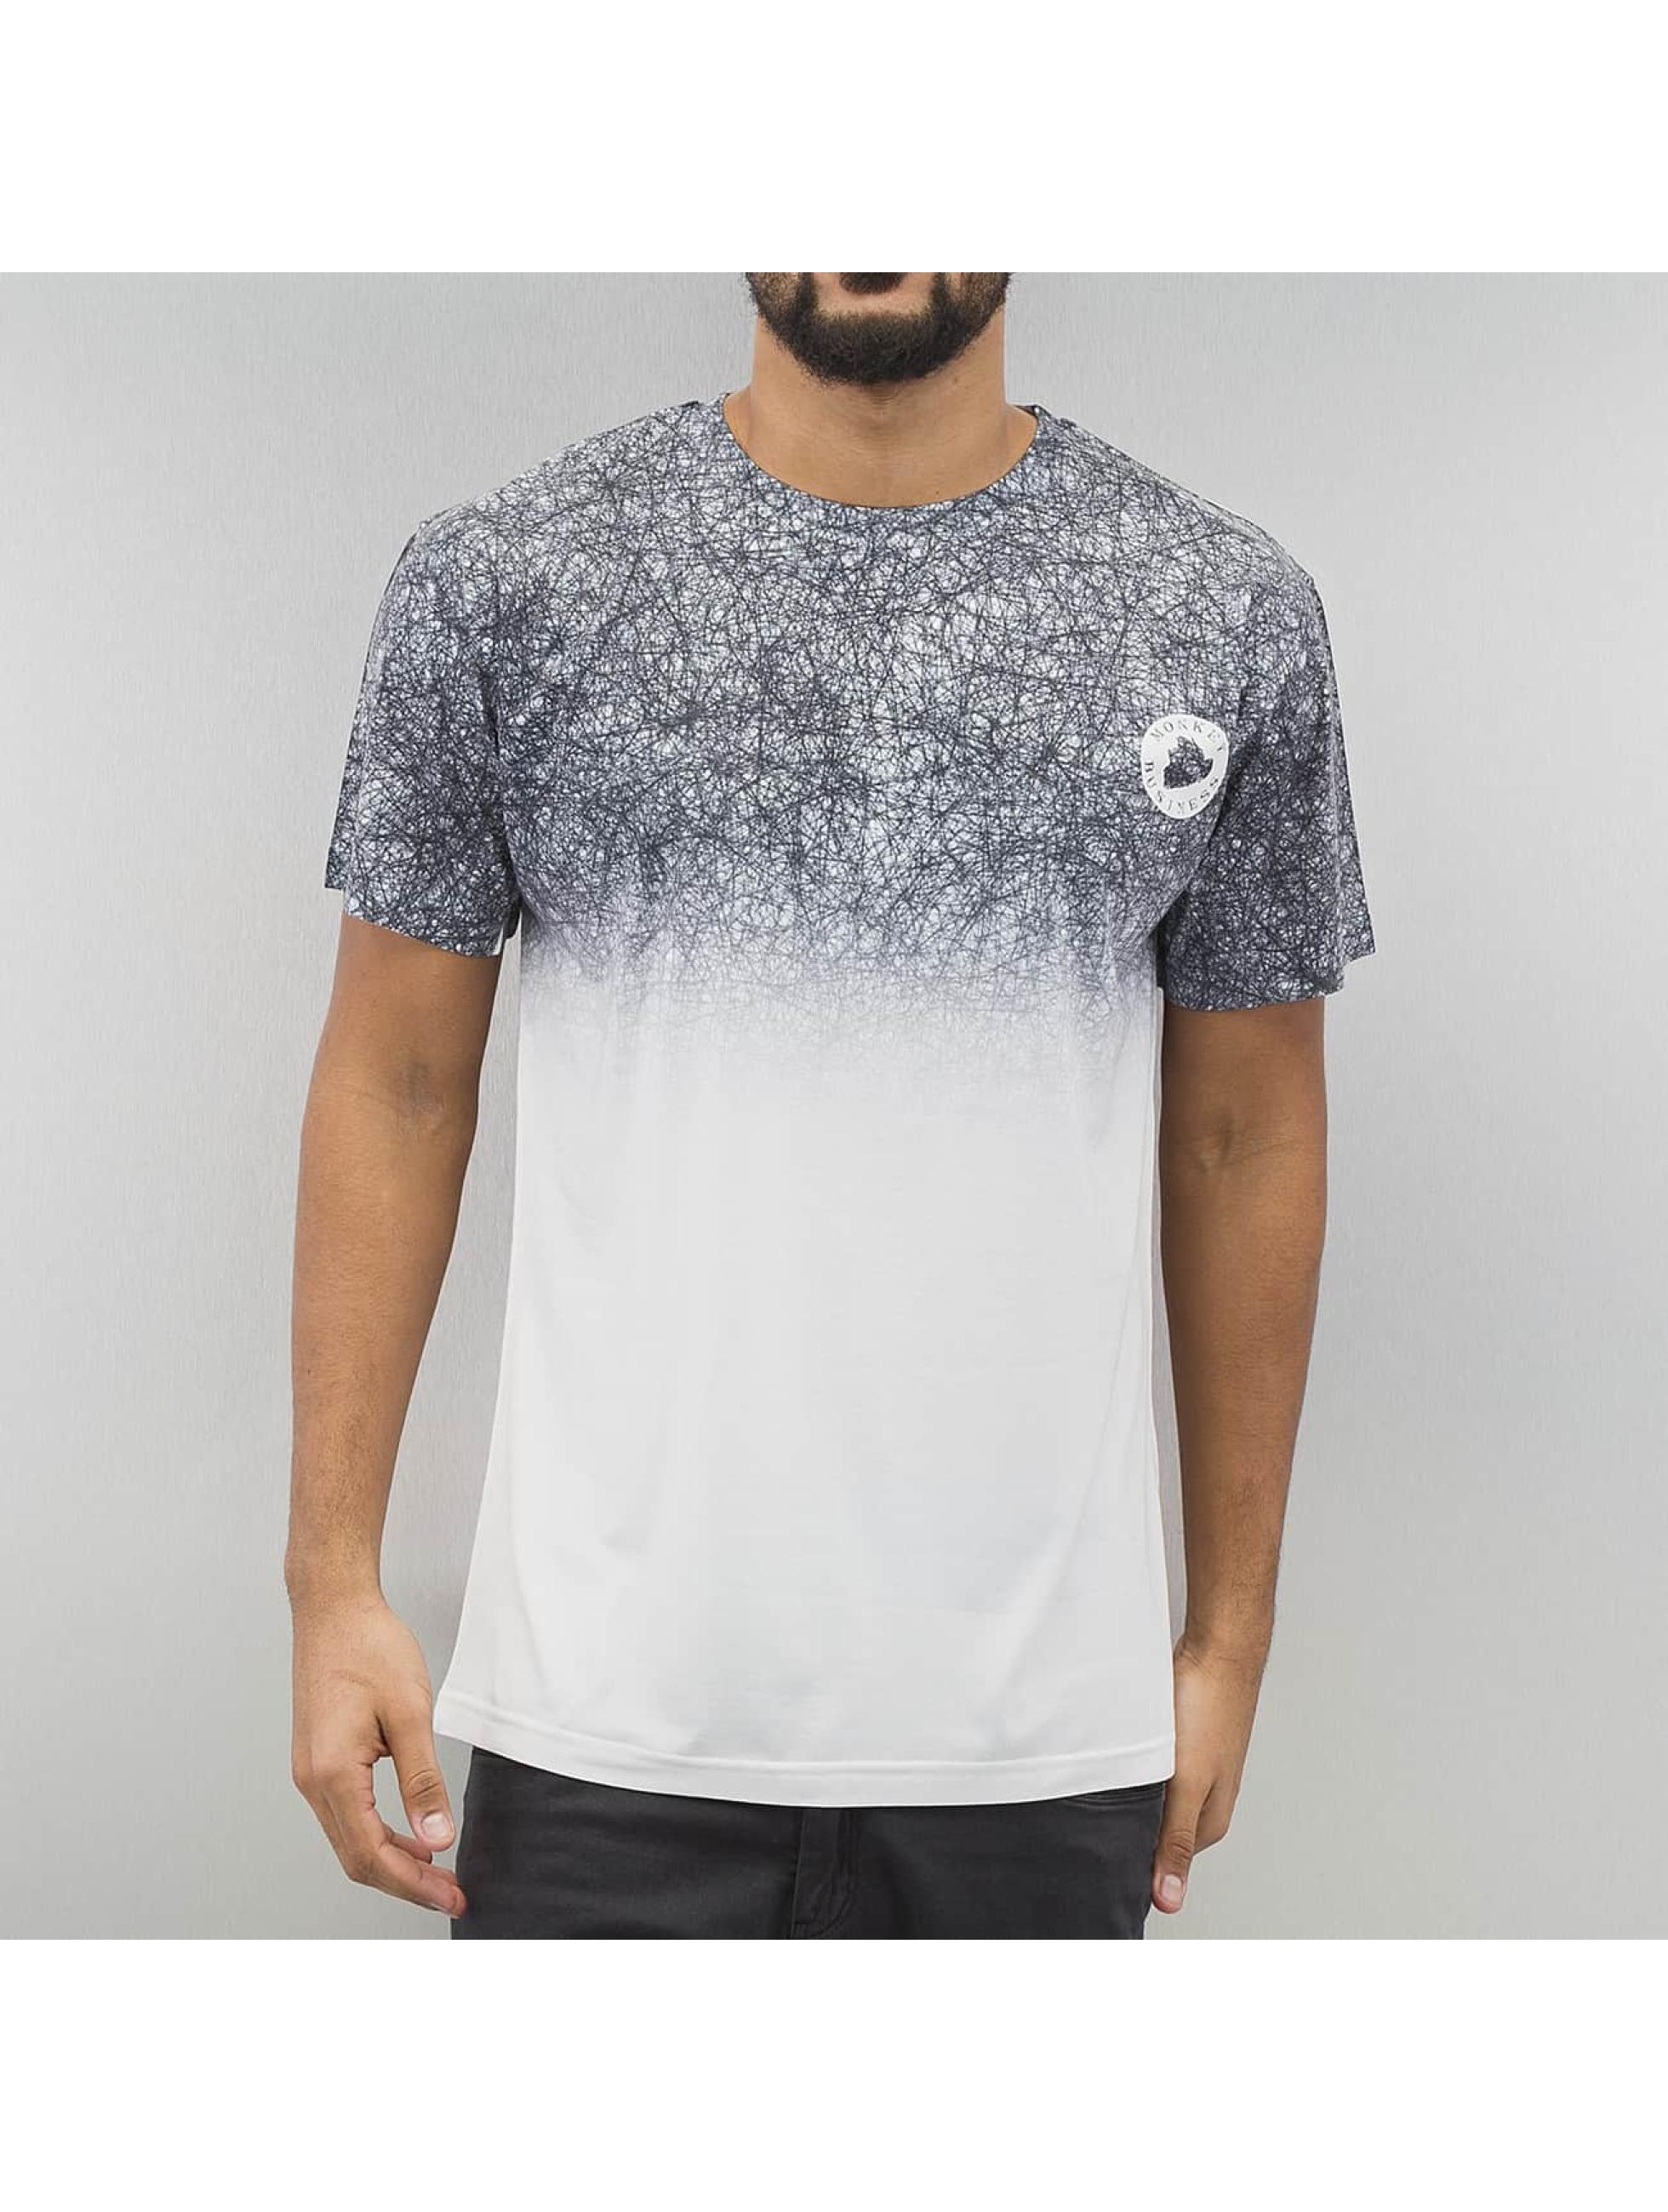 Monkey Business t-shirt Black Scribble grijs